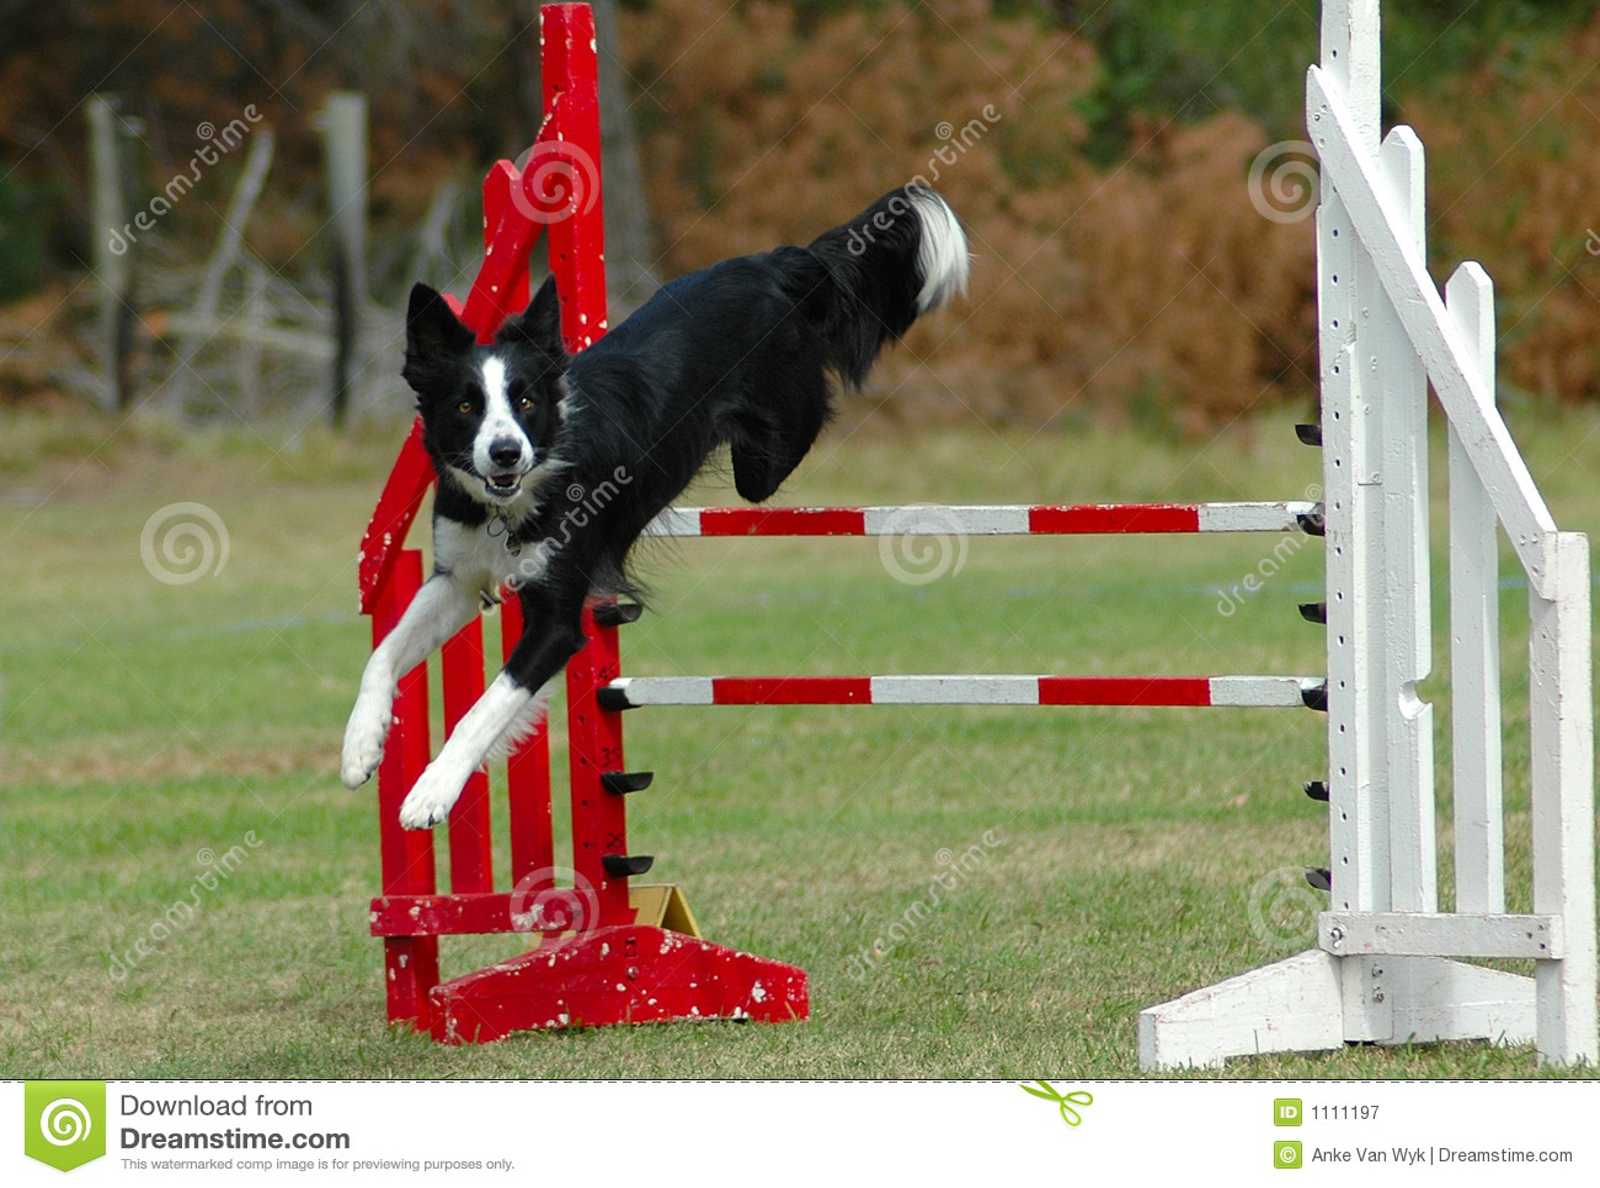 Dog Free Jumping